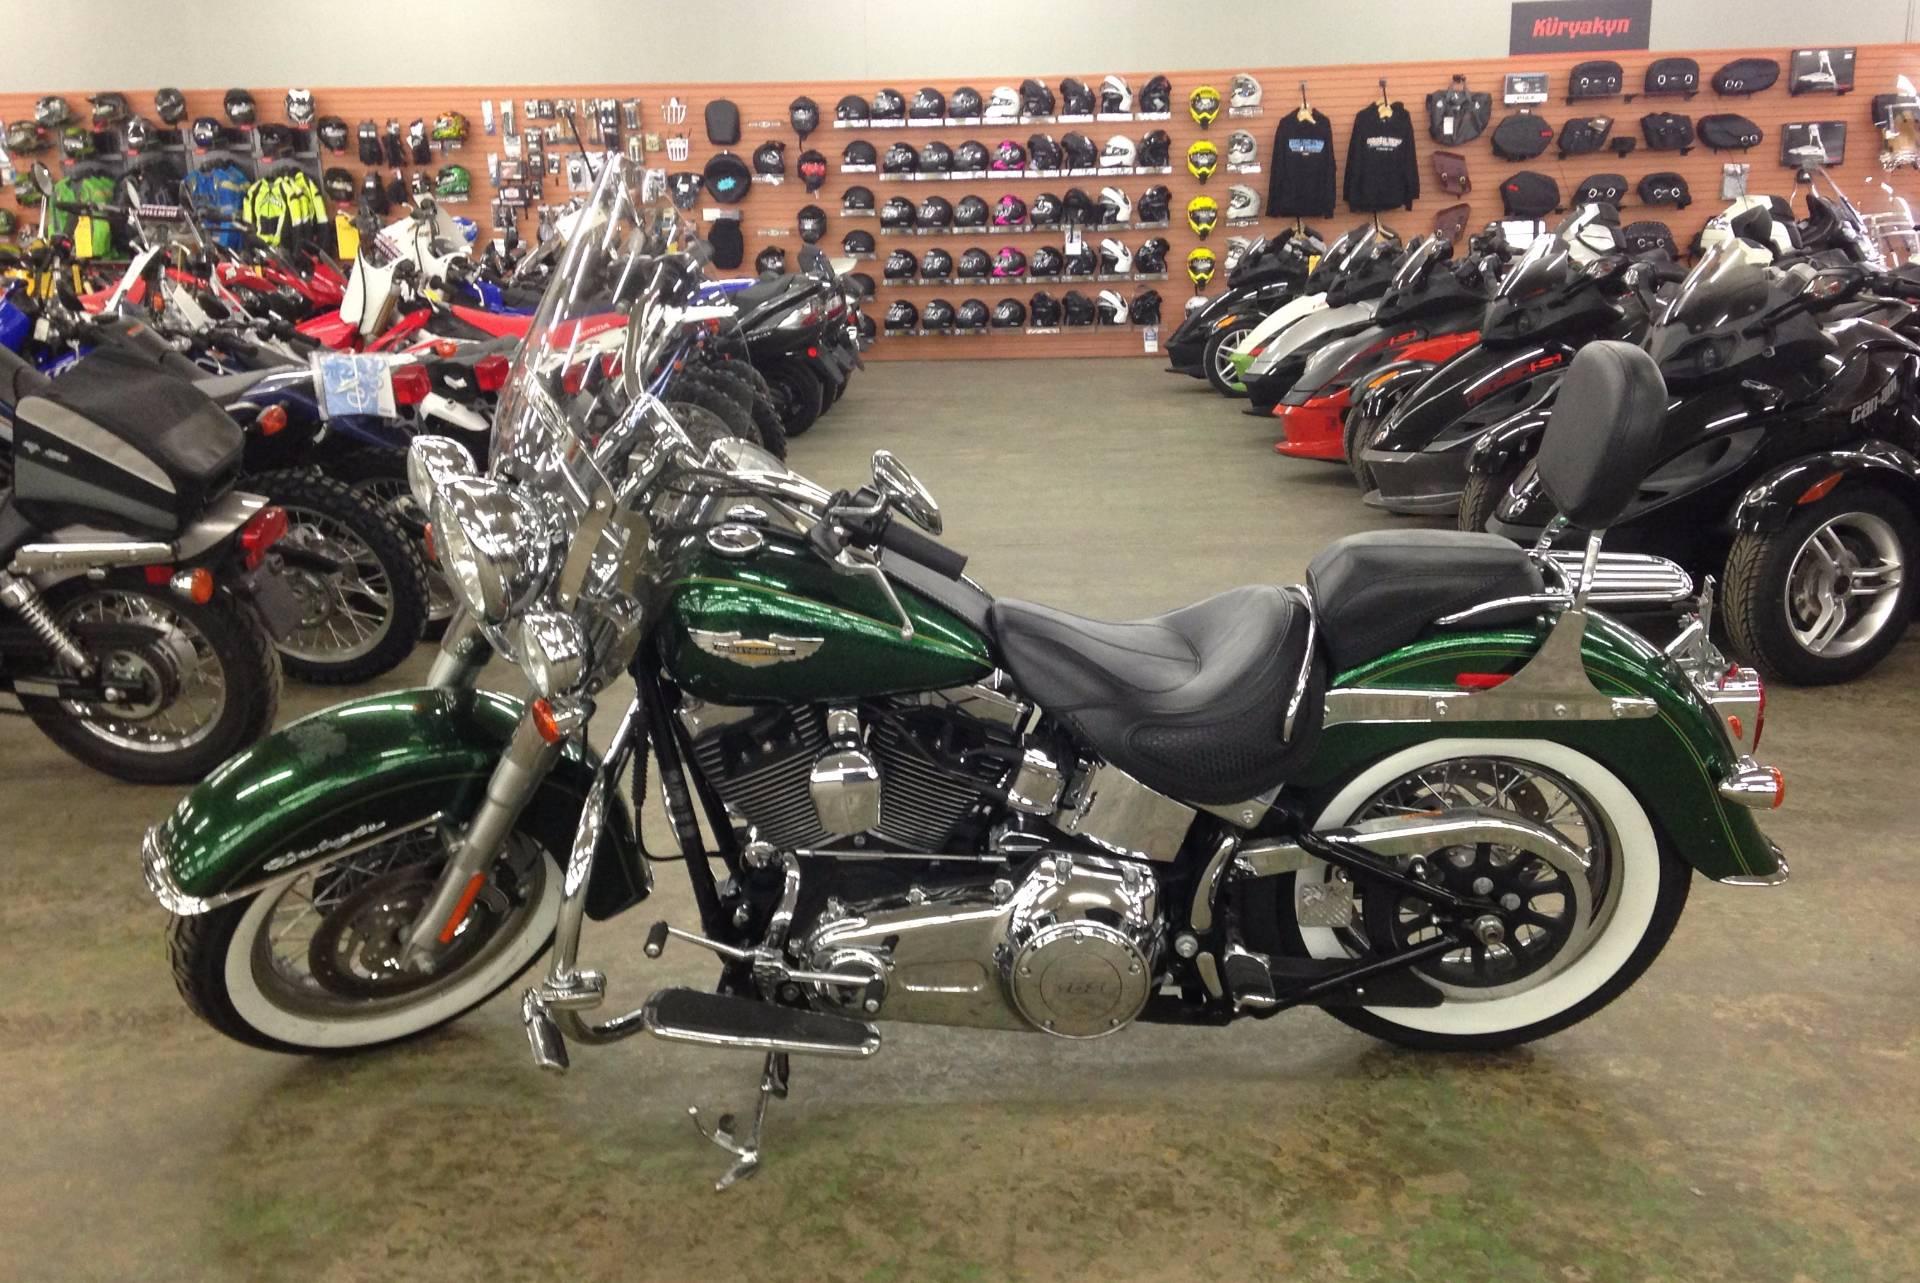 2013 Harley-Davidson Softail® Deluxe in Tyrone, Pennsylvania